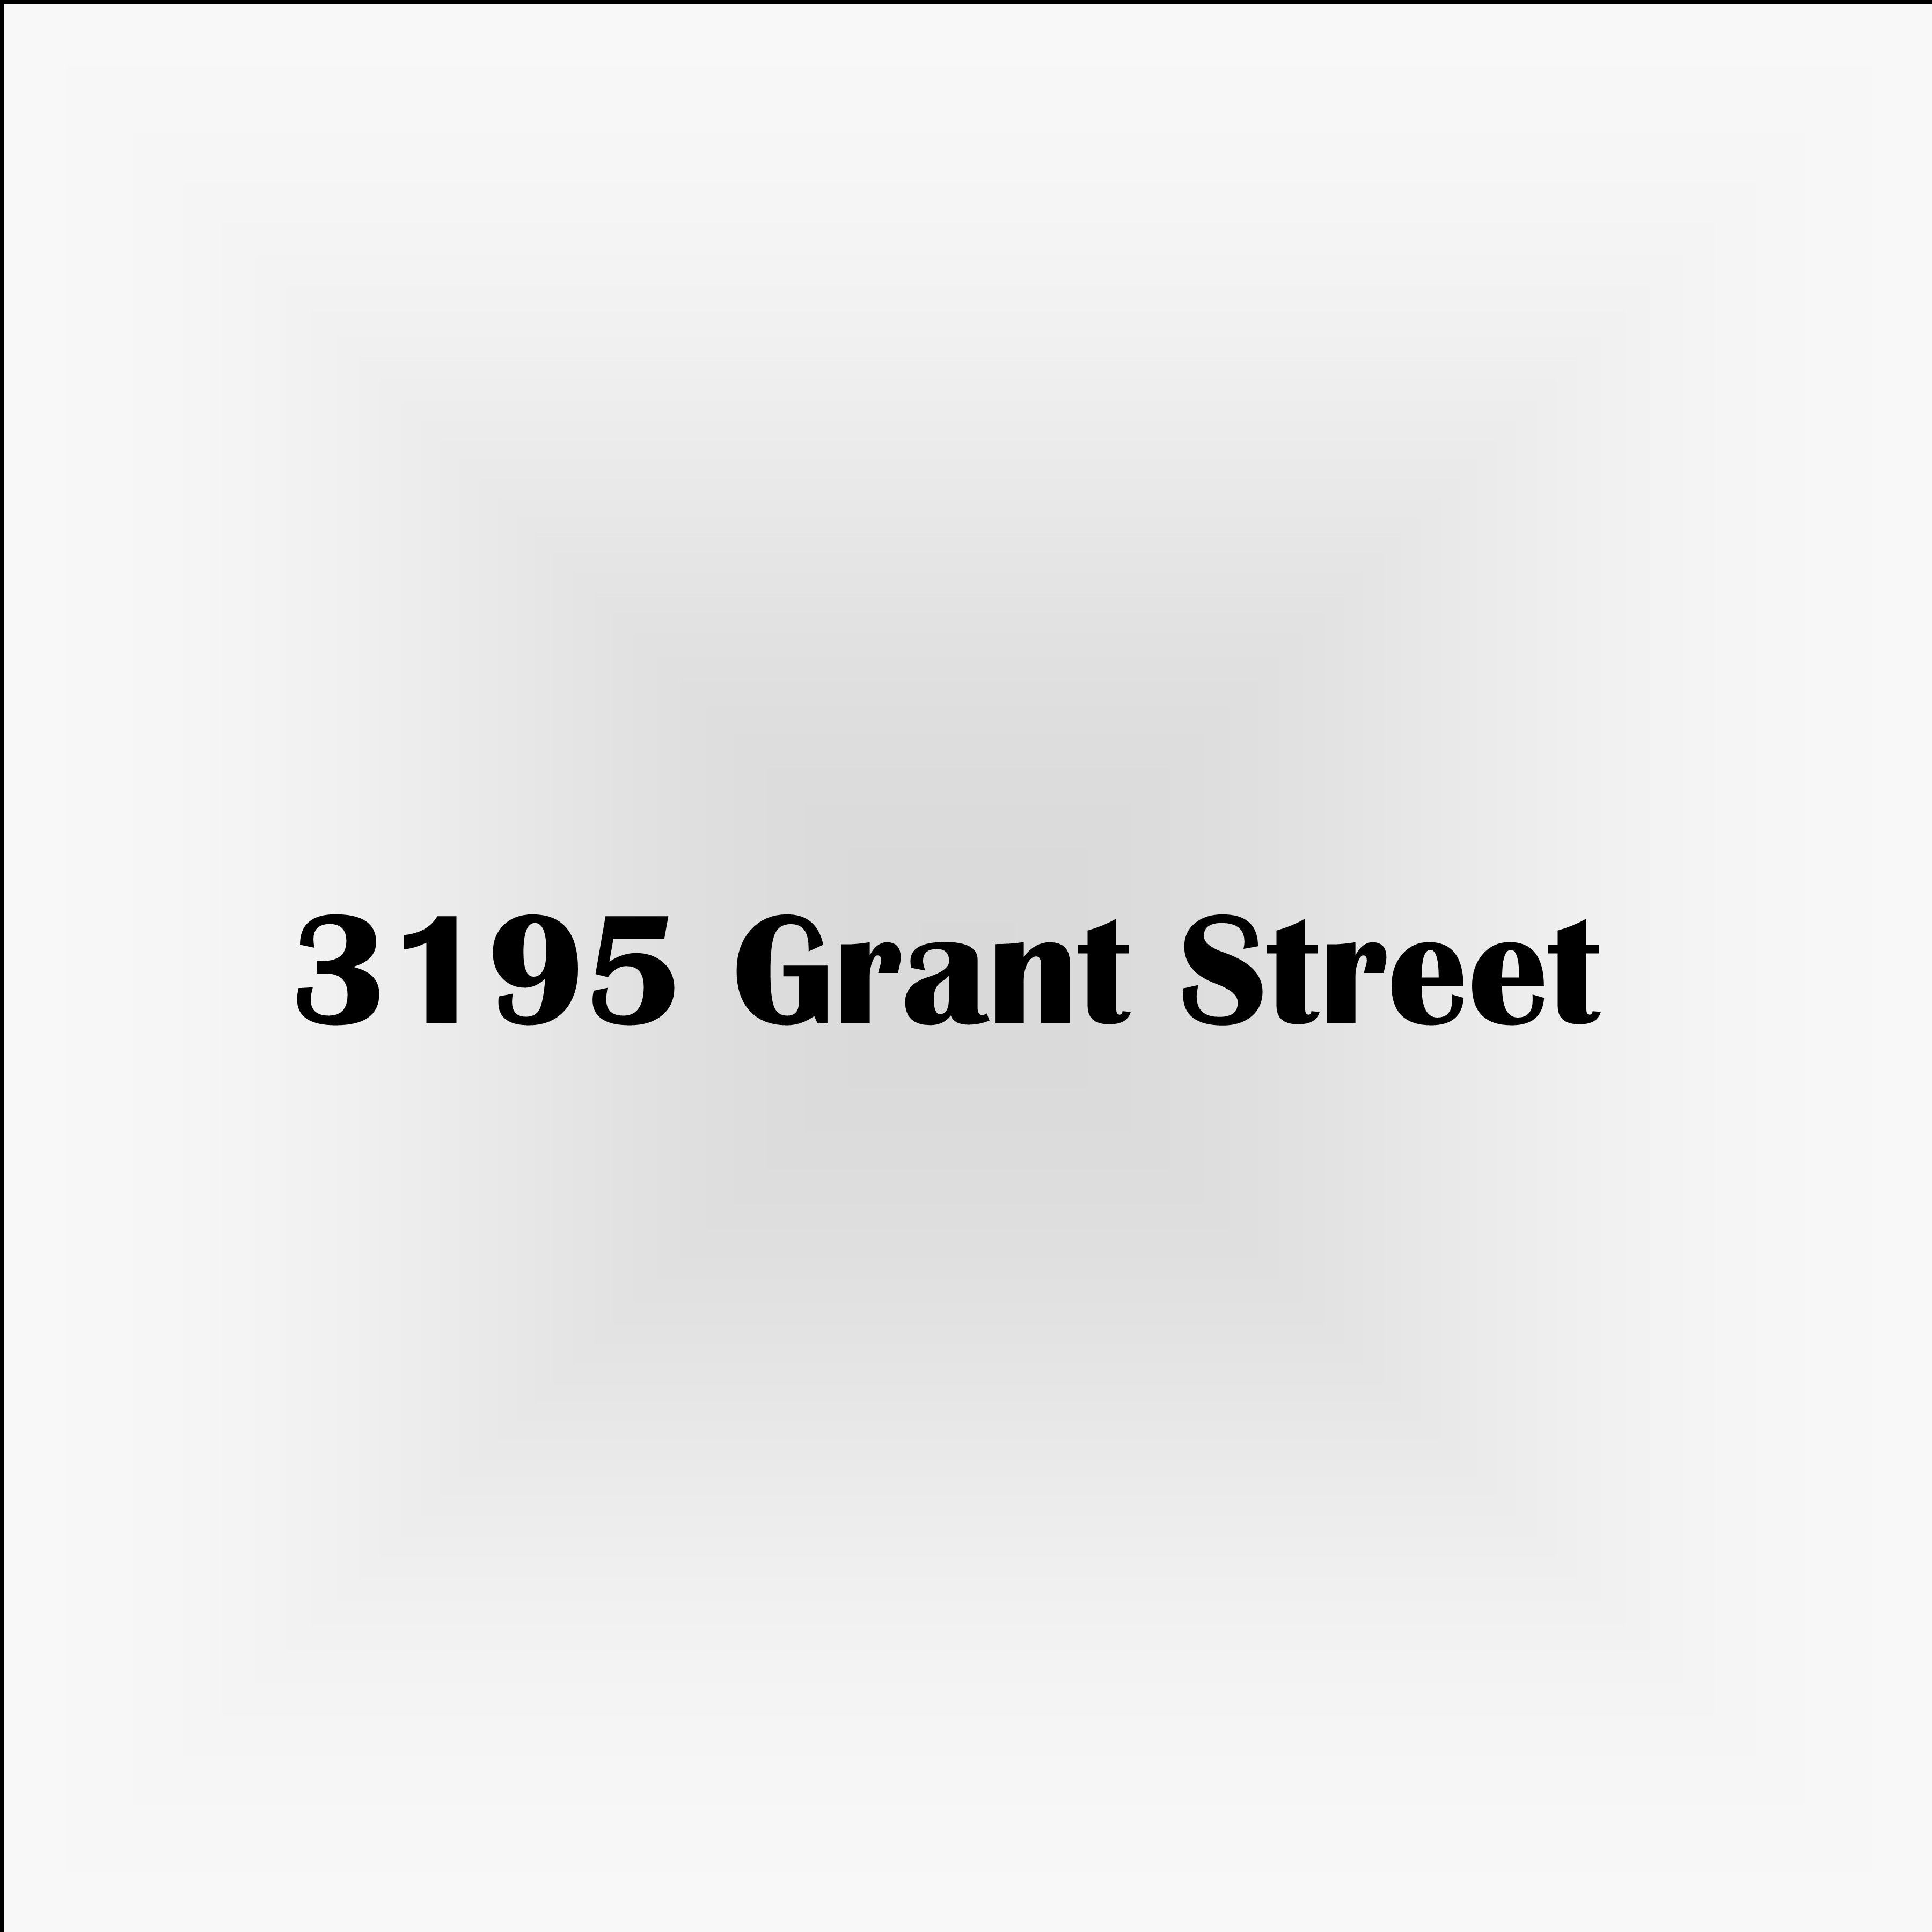 (219) 884-4512